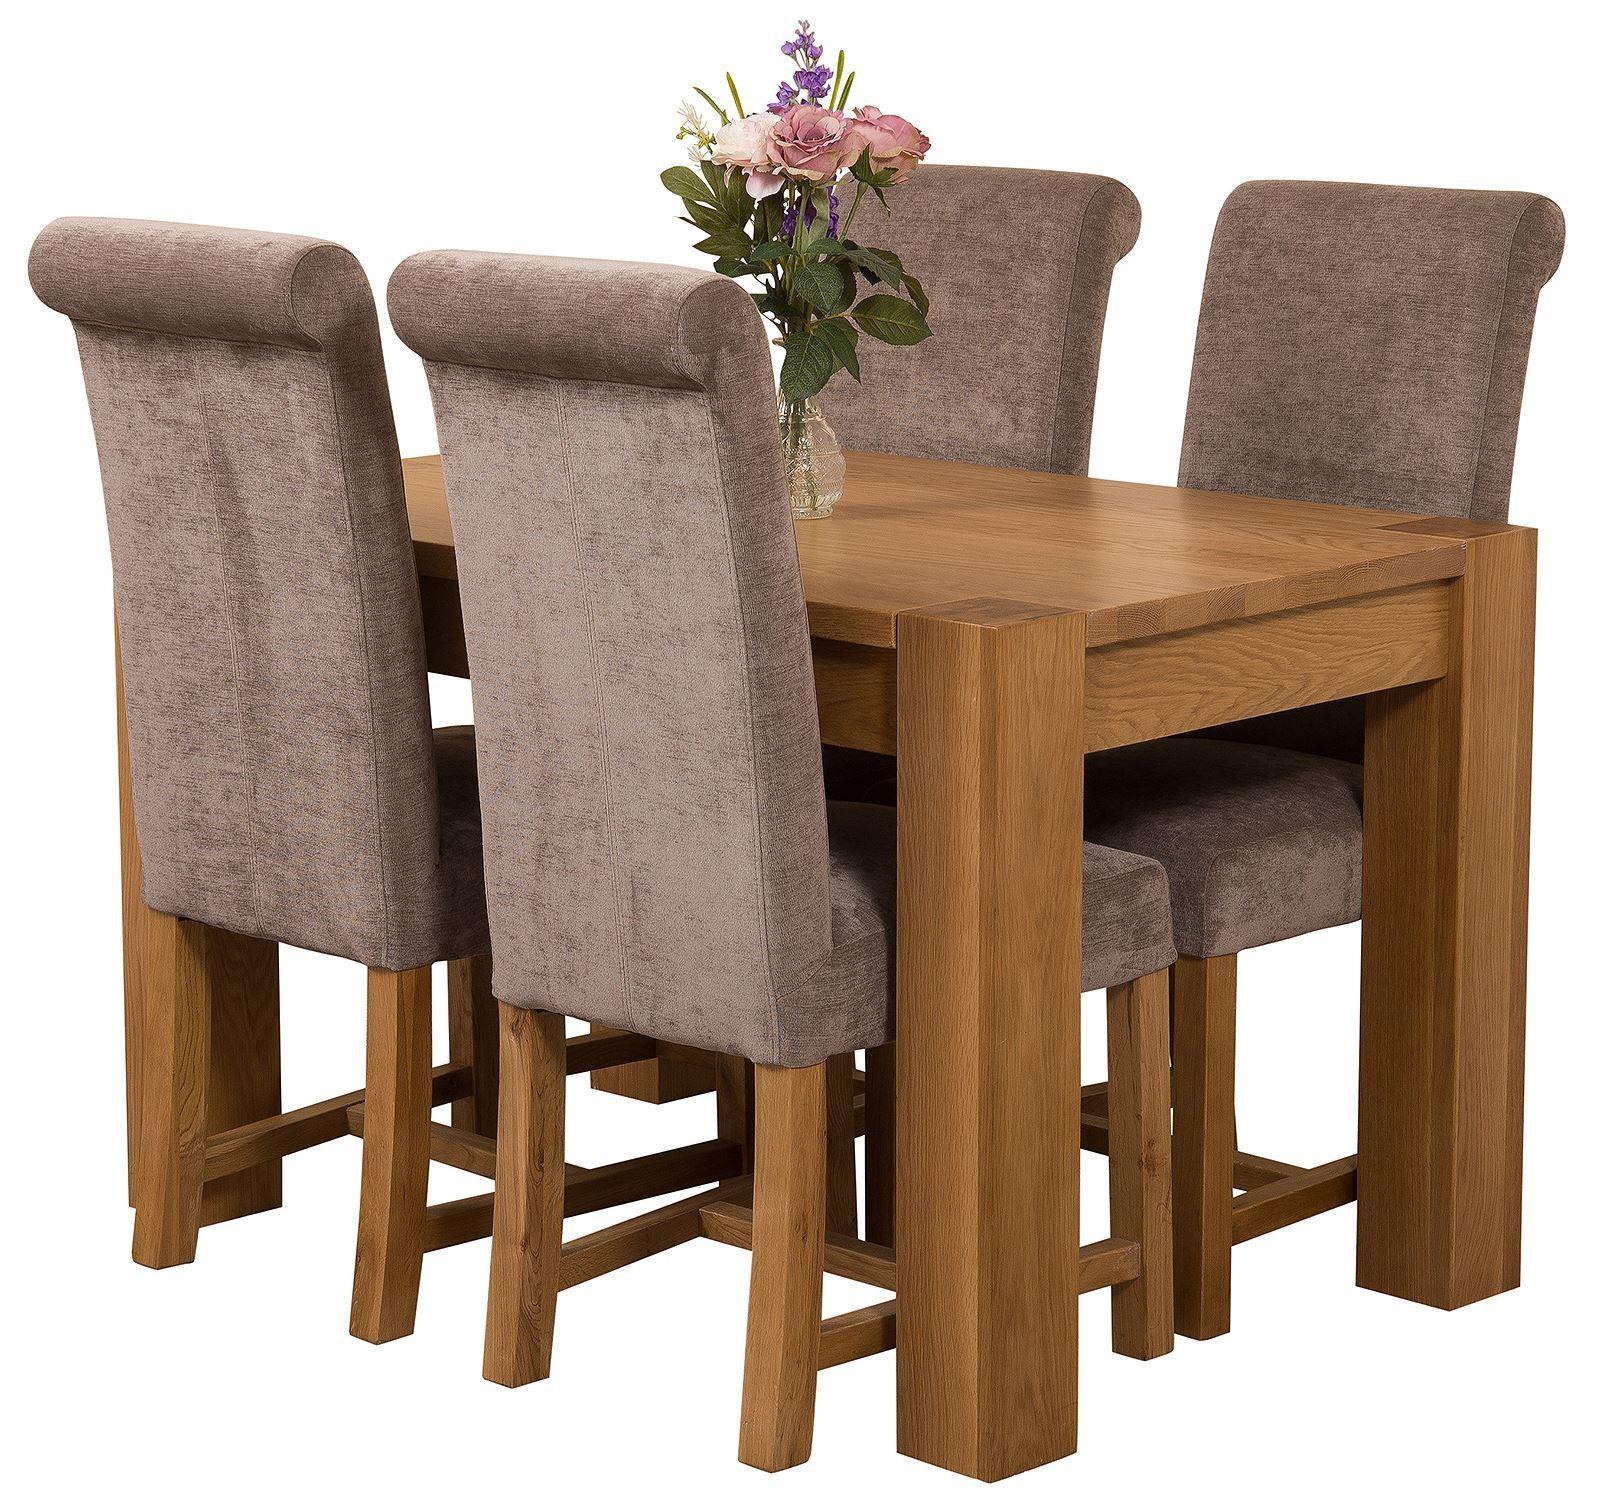 Kuba Solid Oak 125cm Dining Table with 4 Washington Dining Chairs [Grey Fabric]